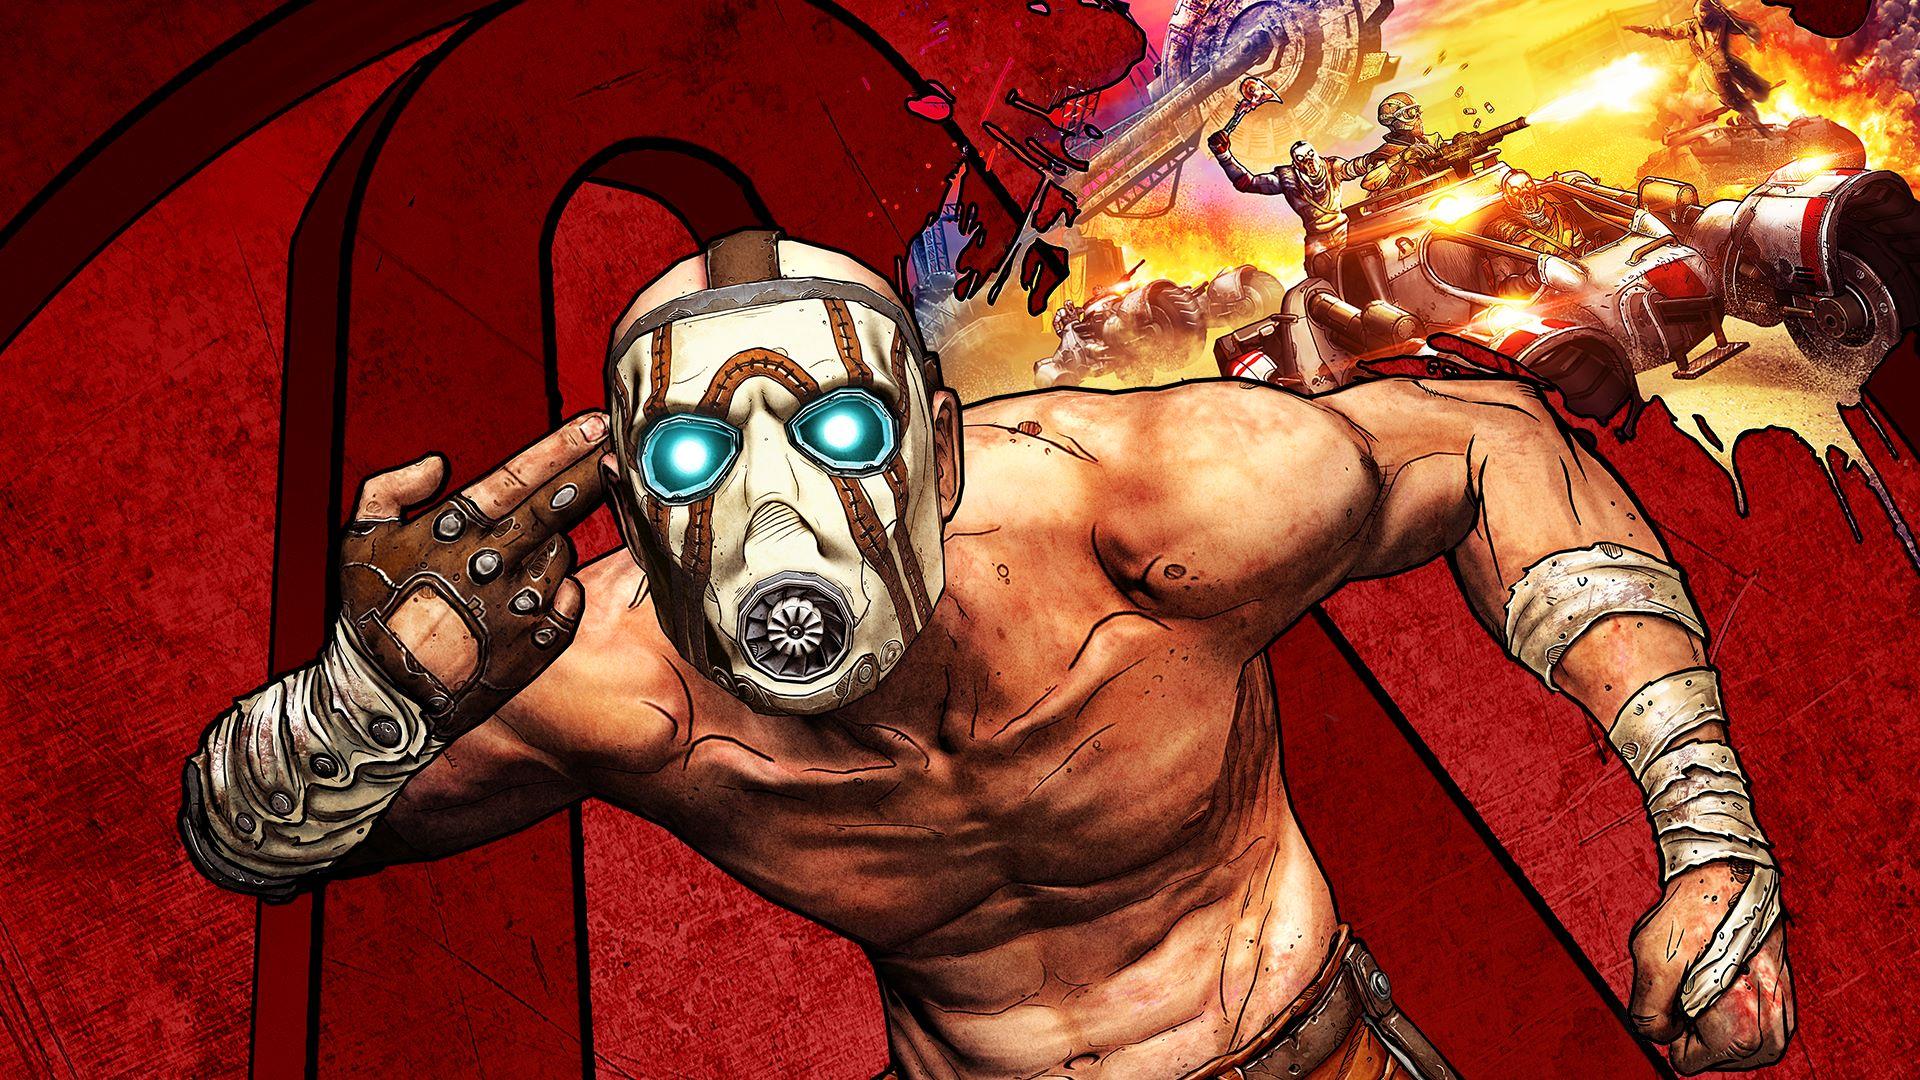 Gearbox被收购 但2K仍然是《无主之地》的发行商